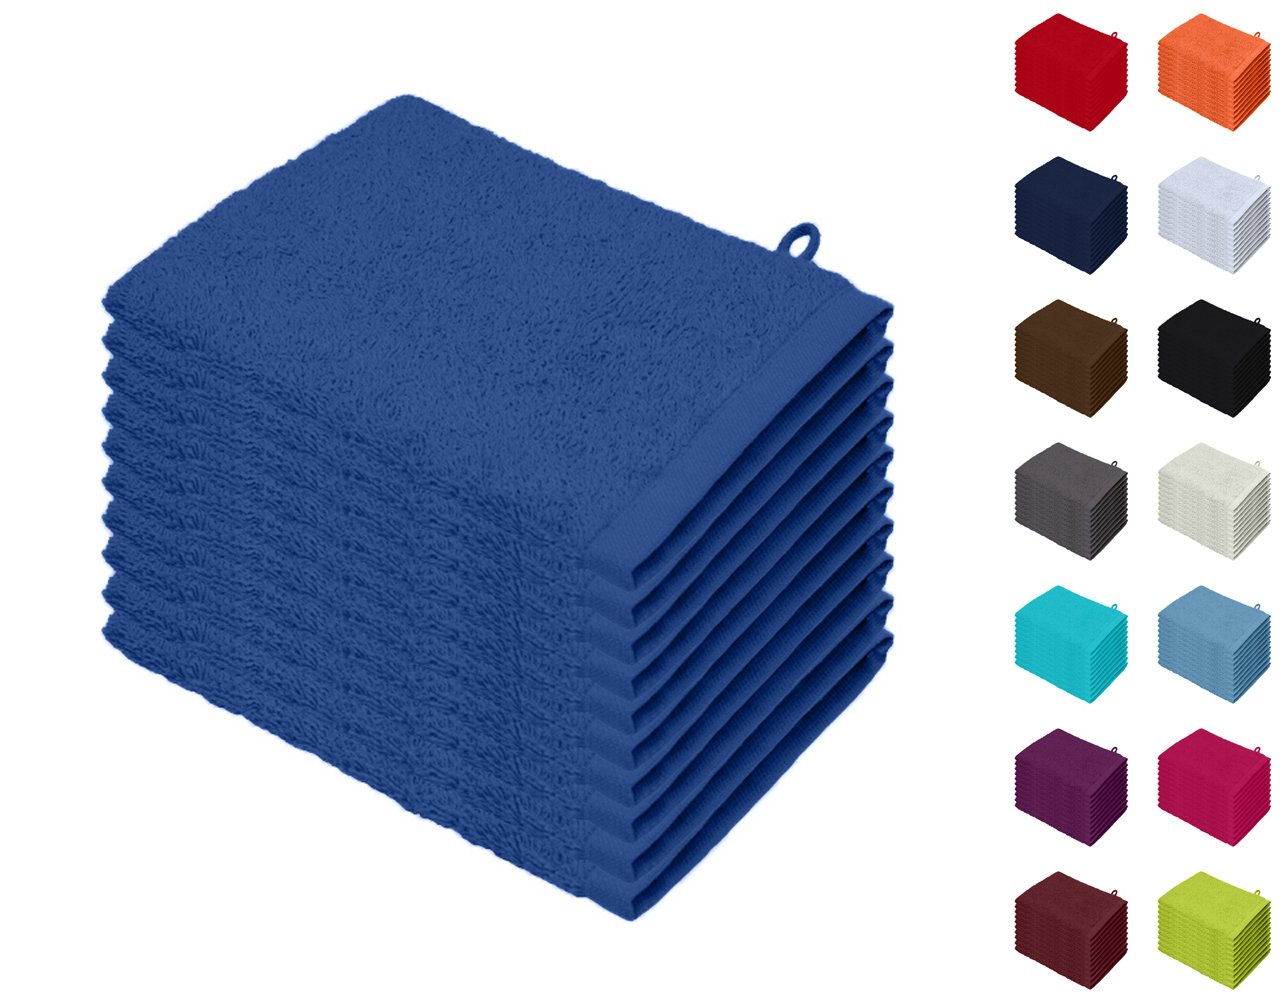 Basatex Juego de 10 Manoplas de ba/ño Waschhandschuhe 15x21 cm 10er Pack tama/ño 15 x 21 cm Azul Real 100/% algod/ón